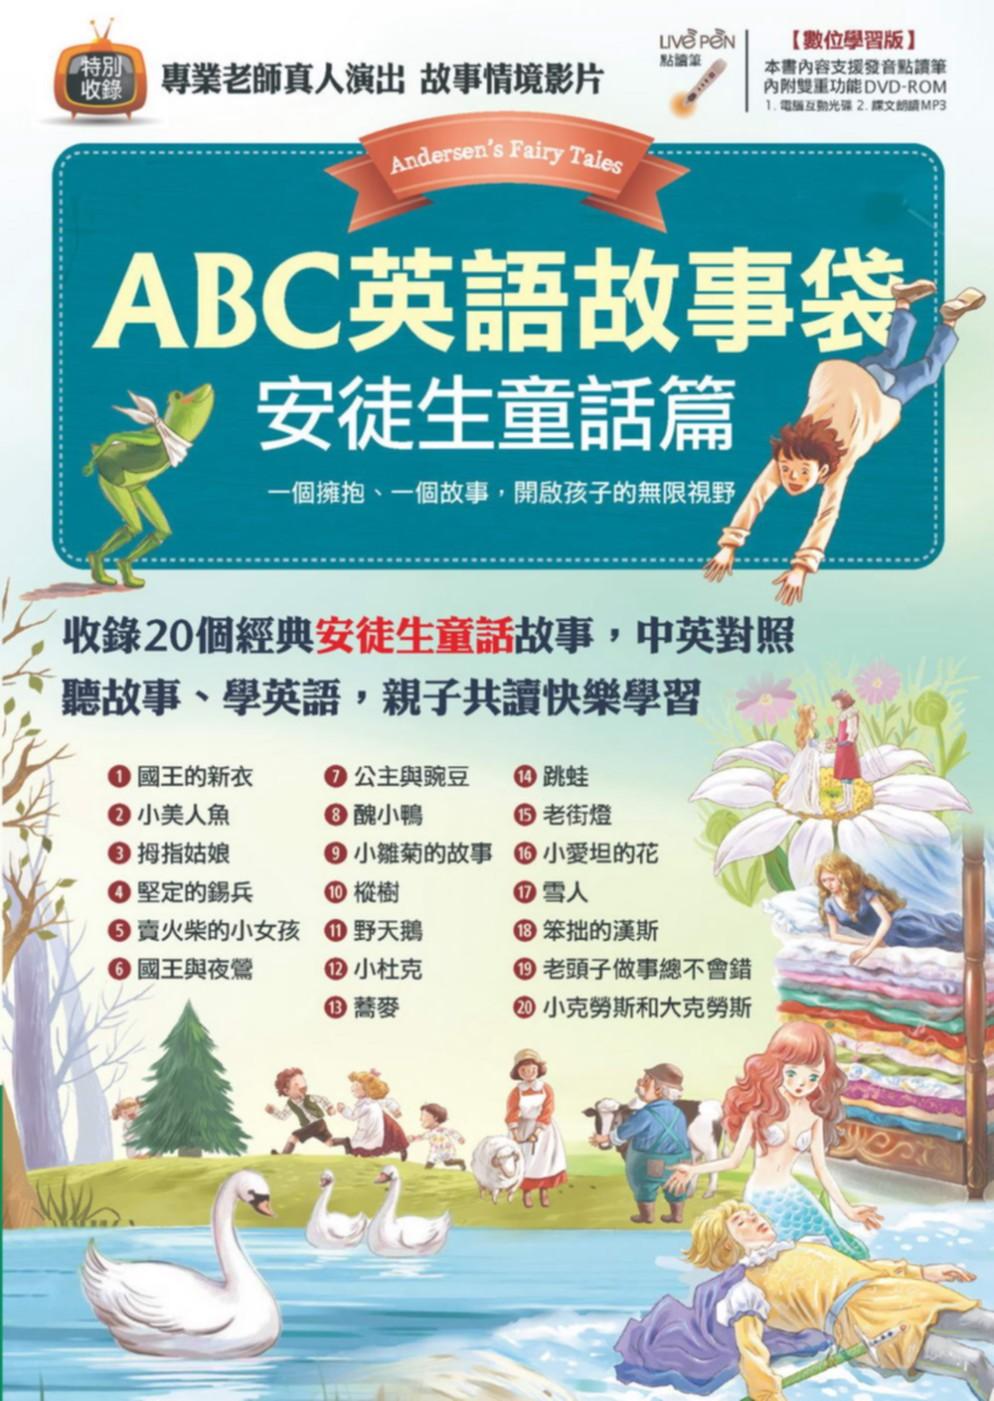 ABC英語故事袋 安徒生童話篇【書+1片DVD電腦互動光碟(含朗讀MP3功能)】